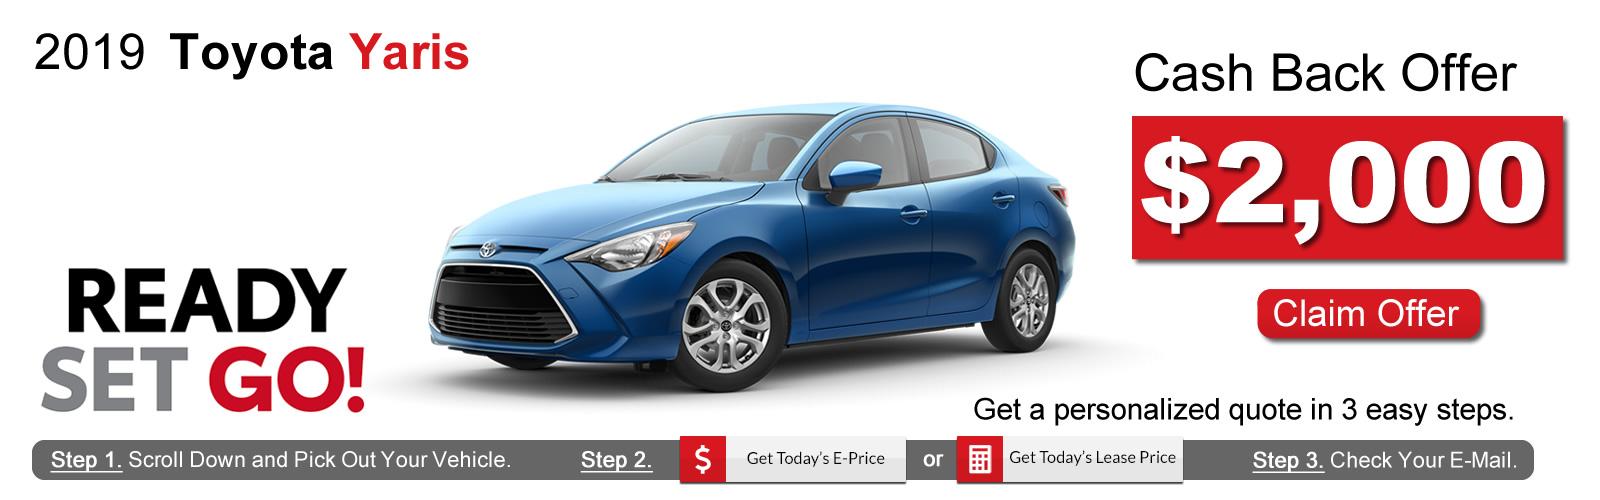 2019 Toyota Yaris Lease Deals near Boston, MA